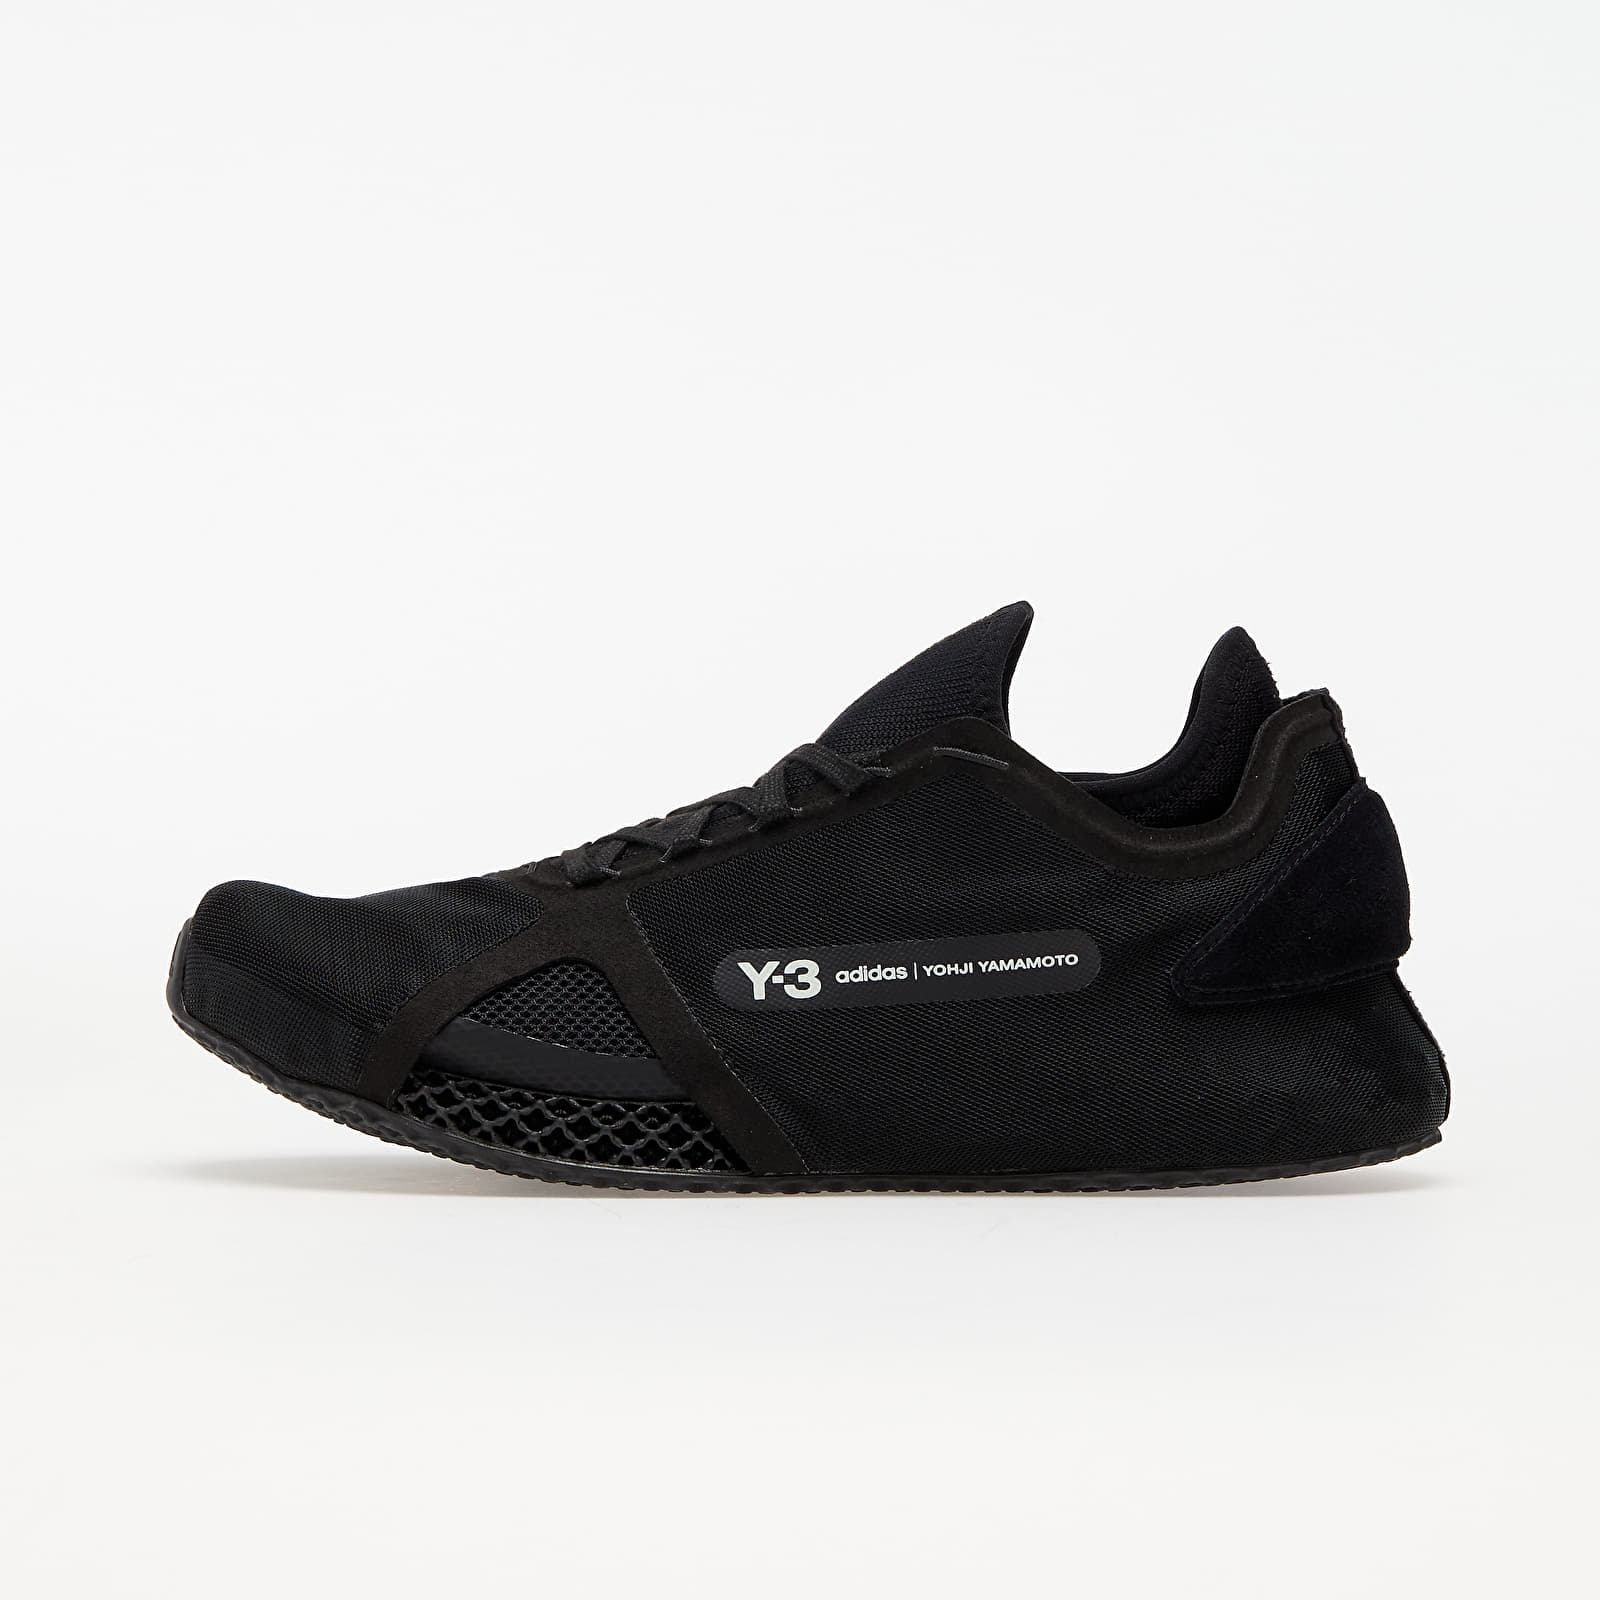 Y-3 Runner 4D Io Black/ Black/ Core White FZ4502